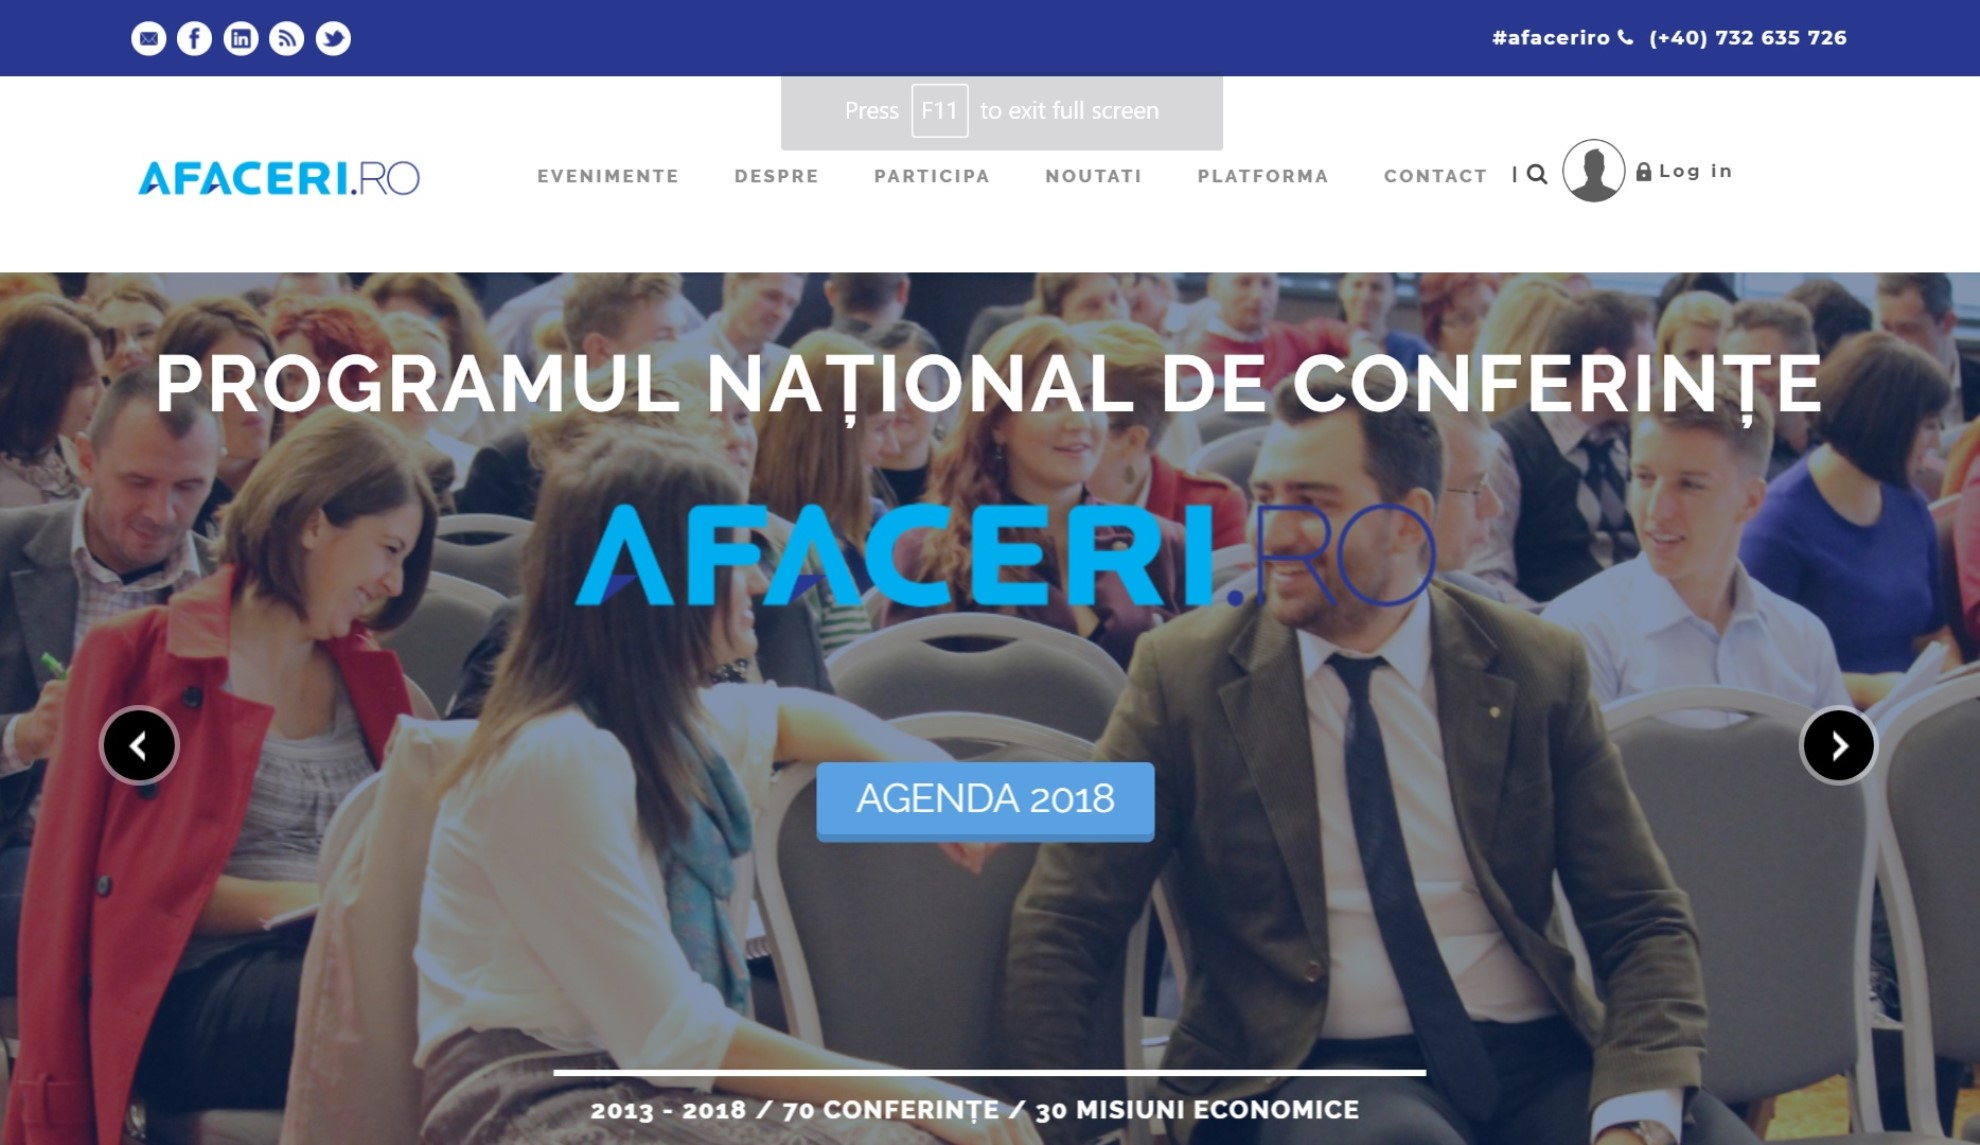 Afaceri.ro | Comunitate si evenimente